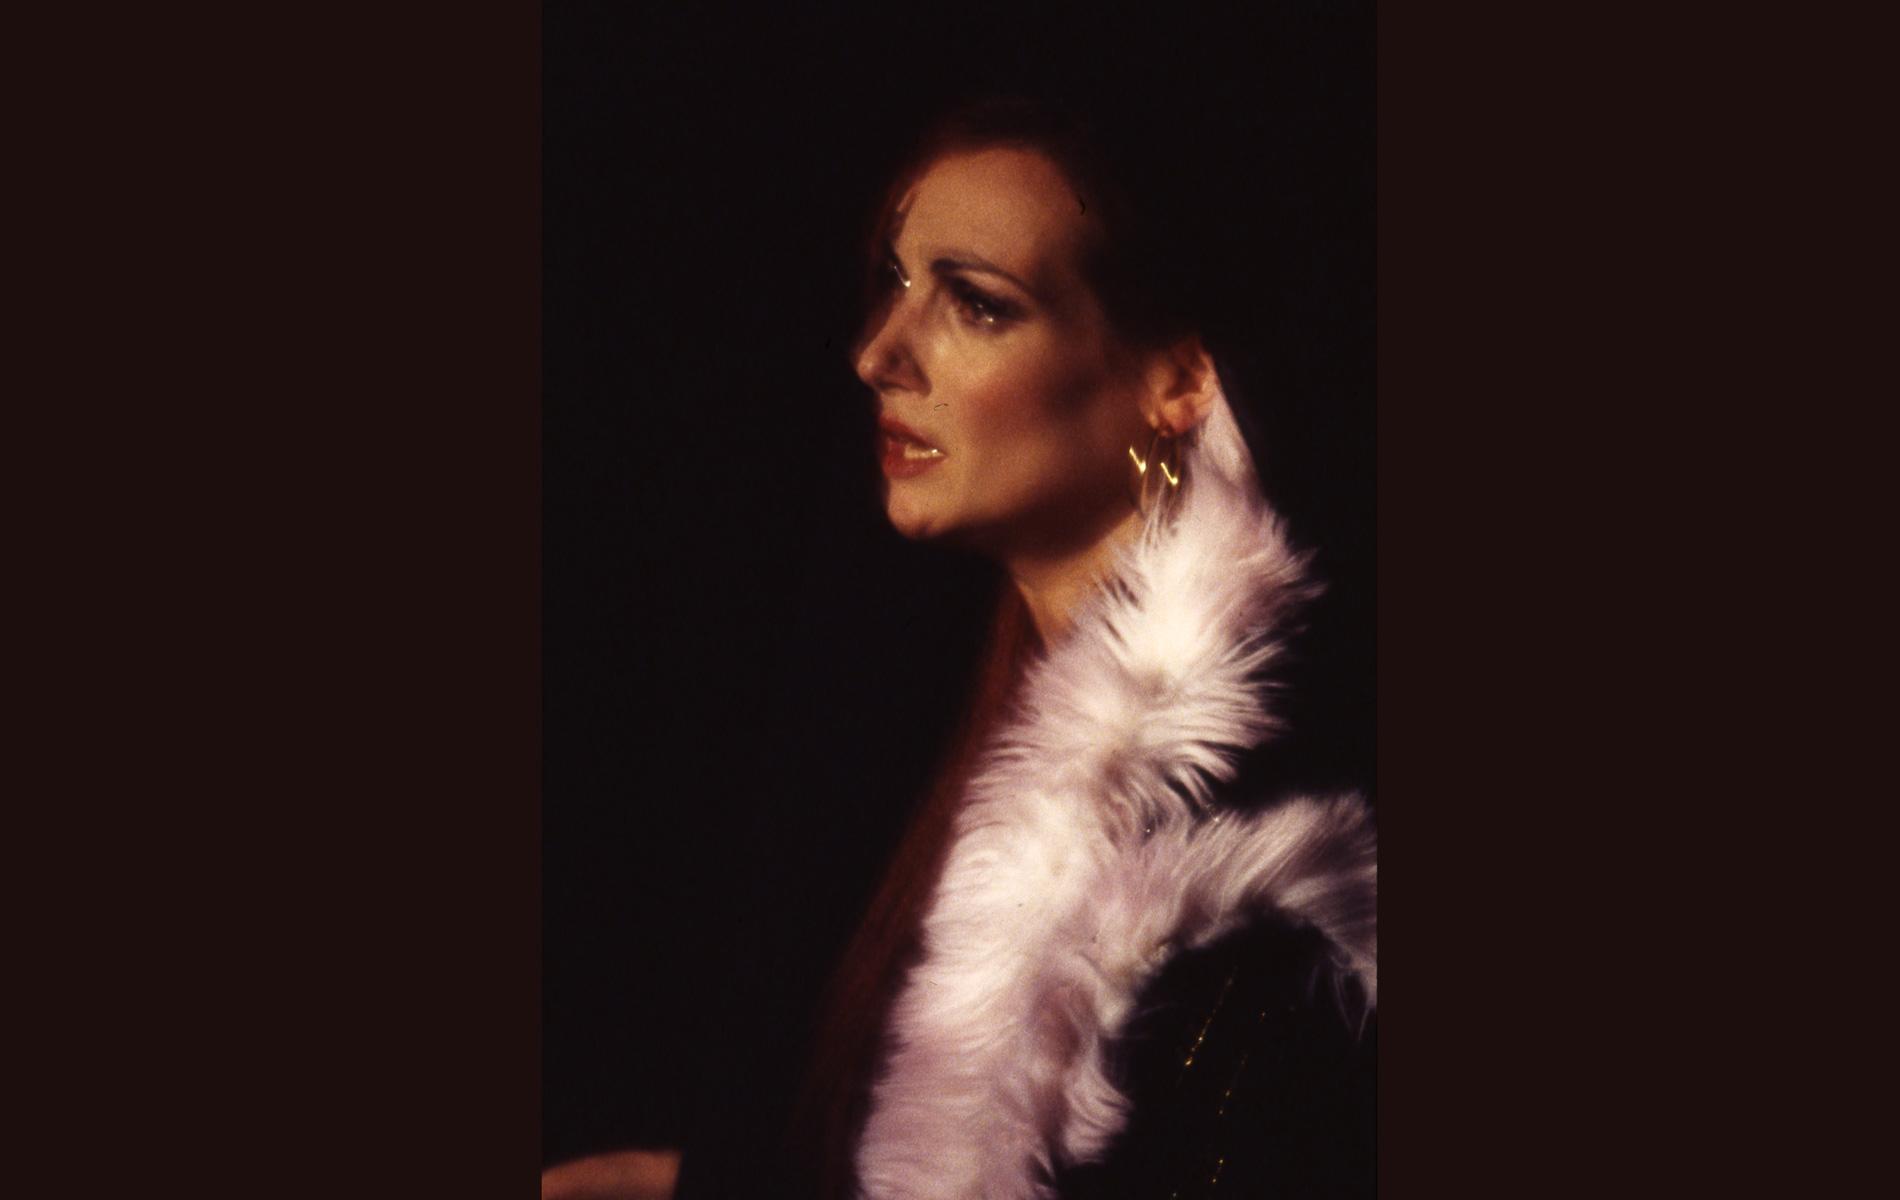 UTE LEMPER - German Singer - Berlin - 1991 - © Graziano Villa